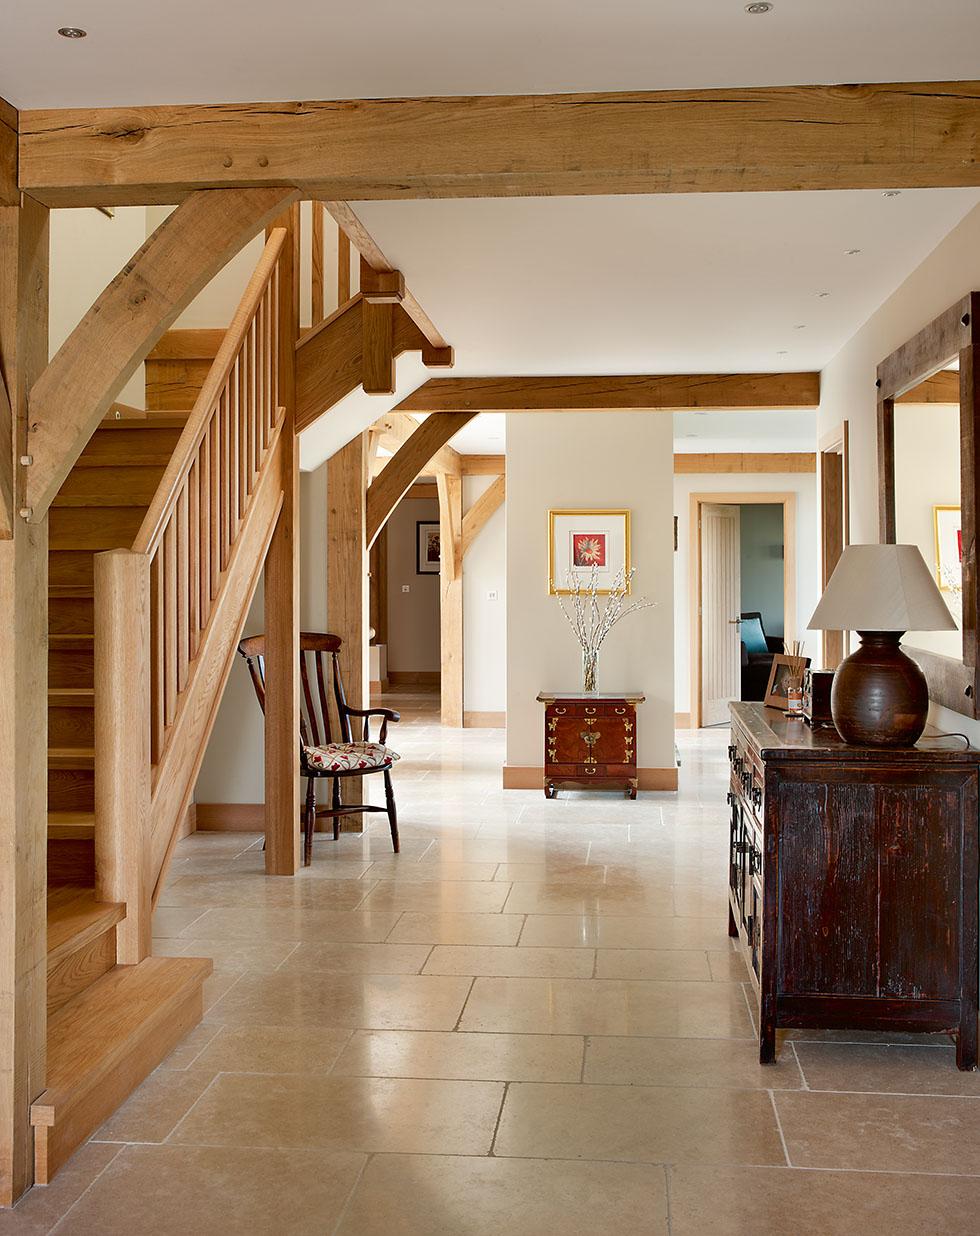 parsons-house-hallway